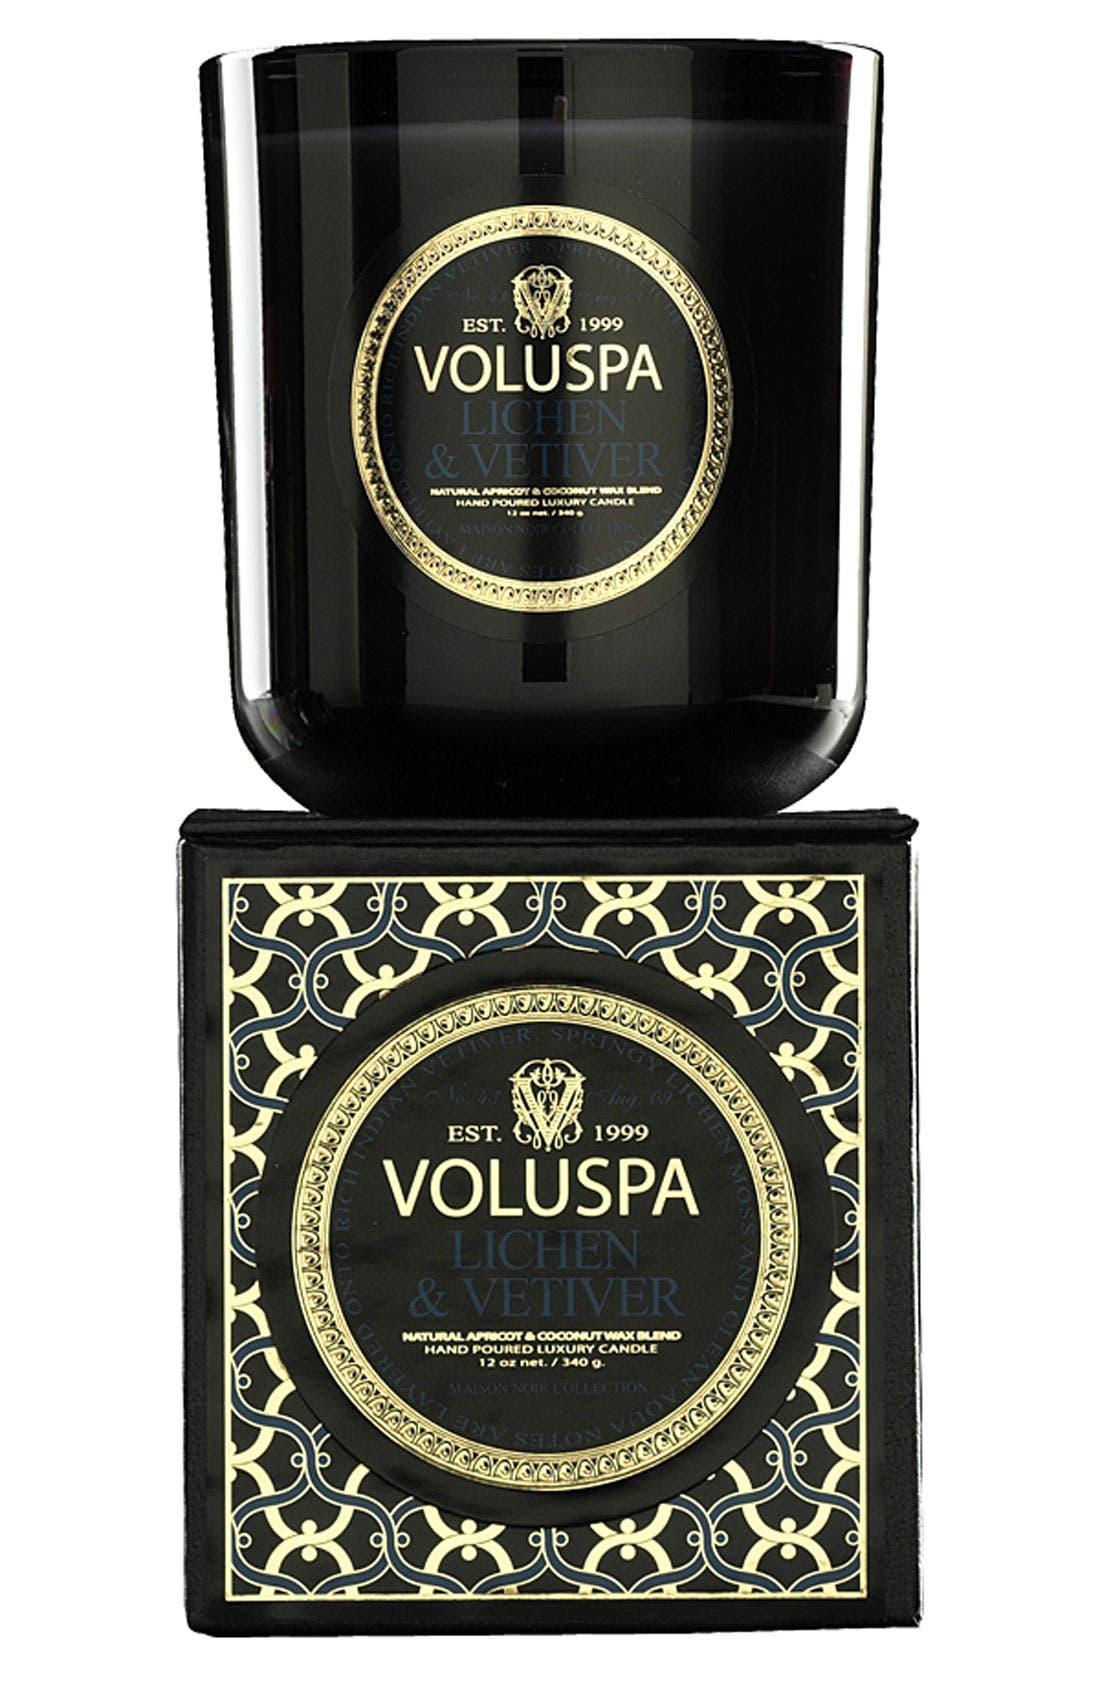 Main Image - Voluspa 'Maison Noir - Lichen & Vetiver' Scented Candle